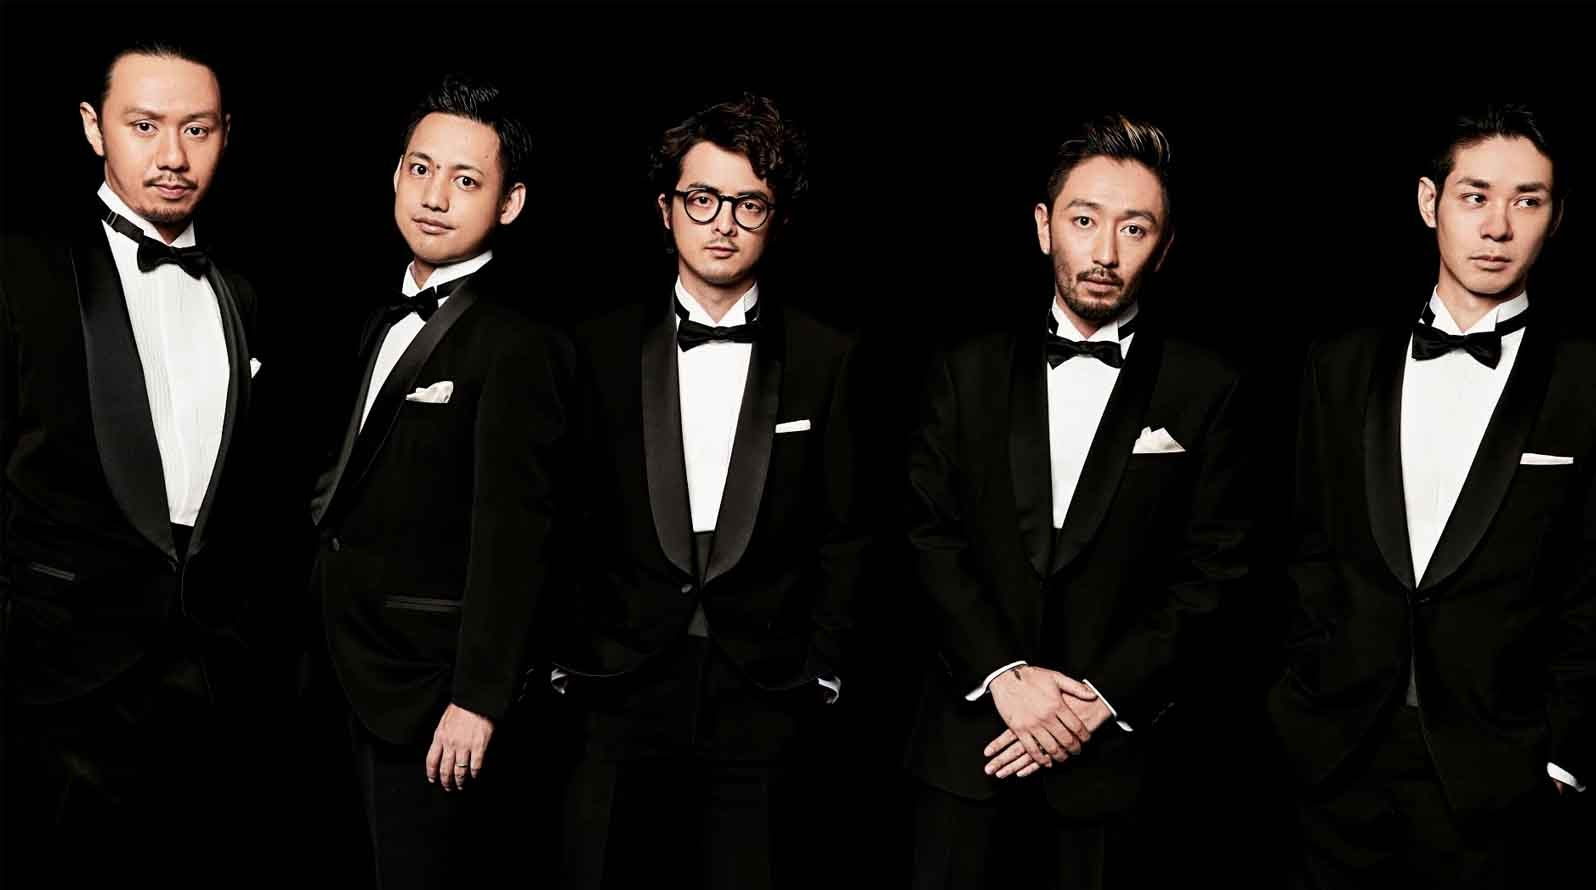 ORANGE RANGE橘子新樂園4月16日台北開唱 來台期待再吃到「那個有蛋的東西?」